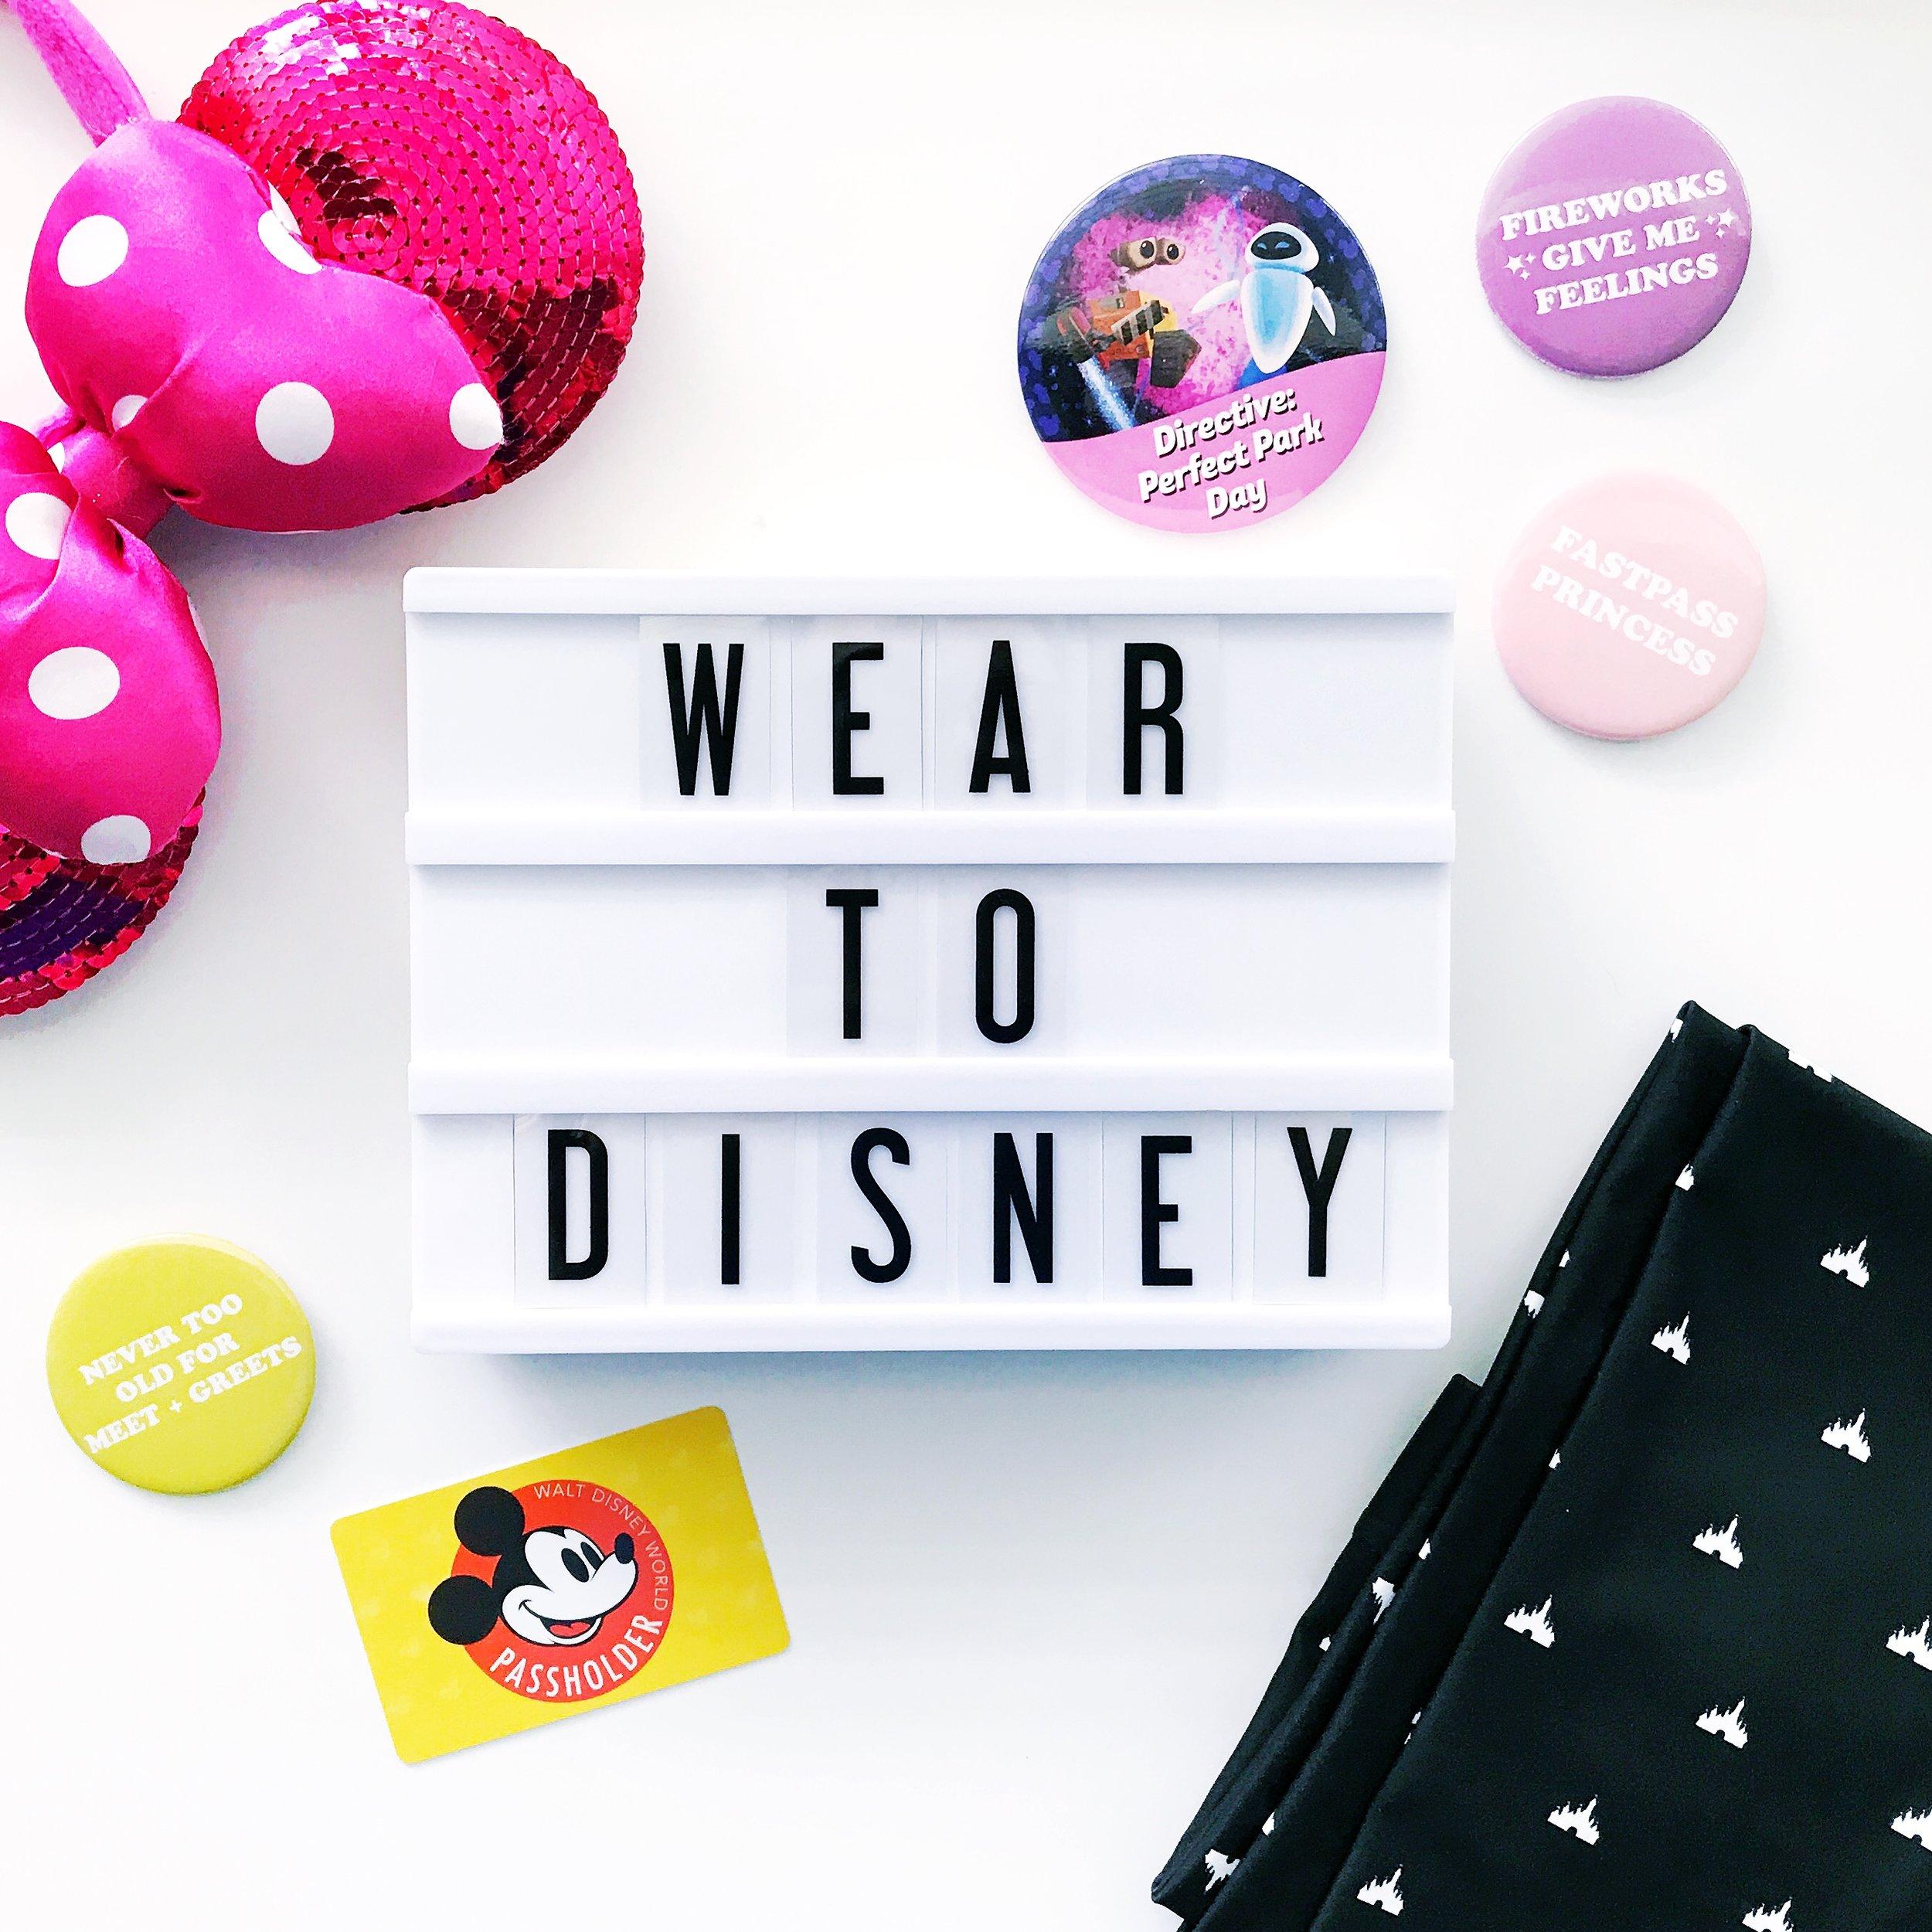 Wear to Disney